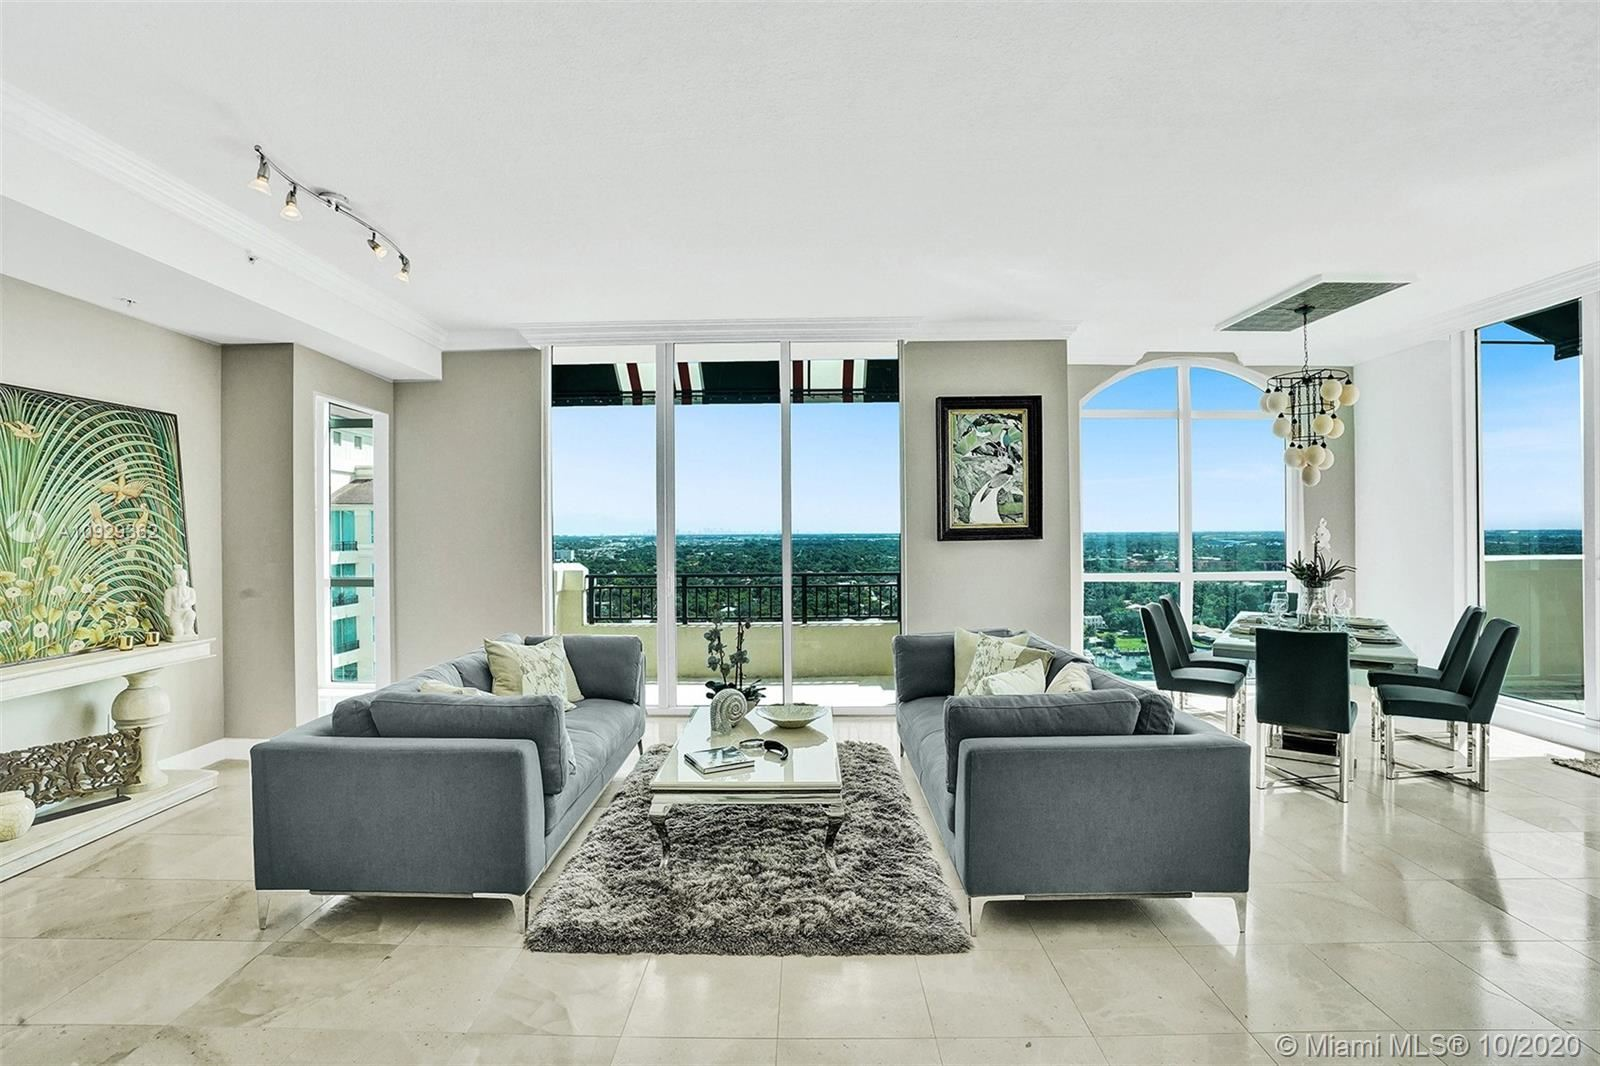 610 W Las Olas Blvd #2211N, Fort Lauderdale, FL 33312 - #: A10929362